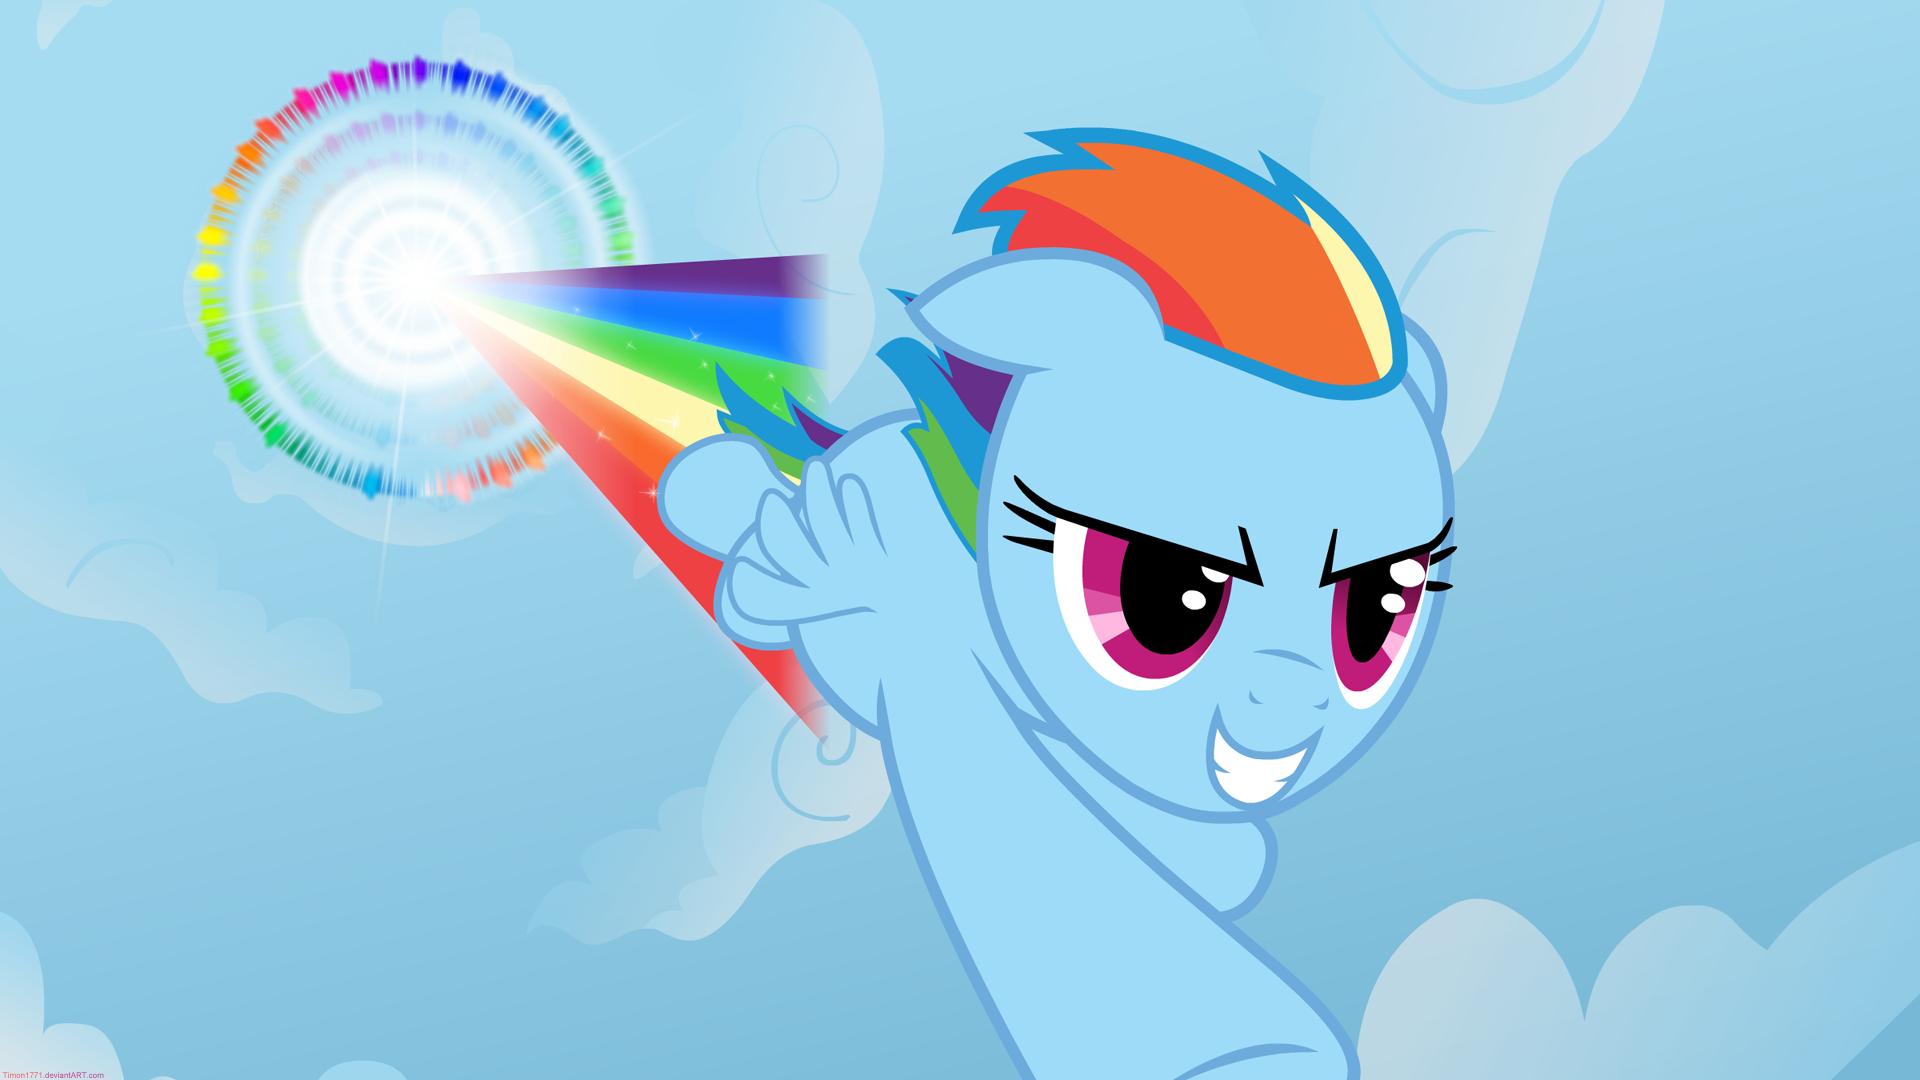 Wallpaper My Little Pony Rainbow Dash 1920x1080 Jpntr